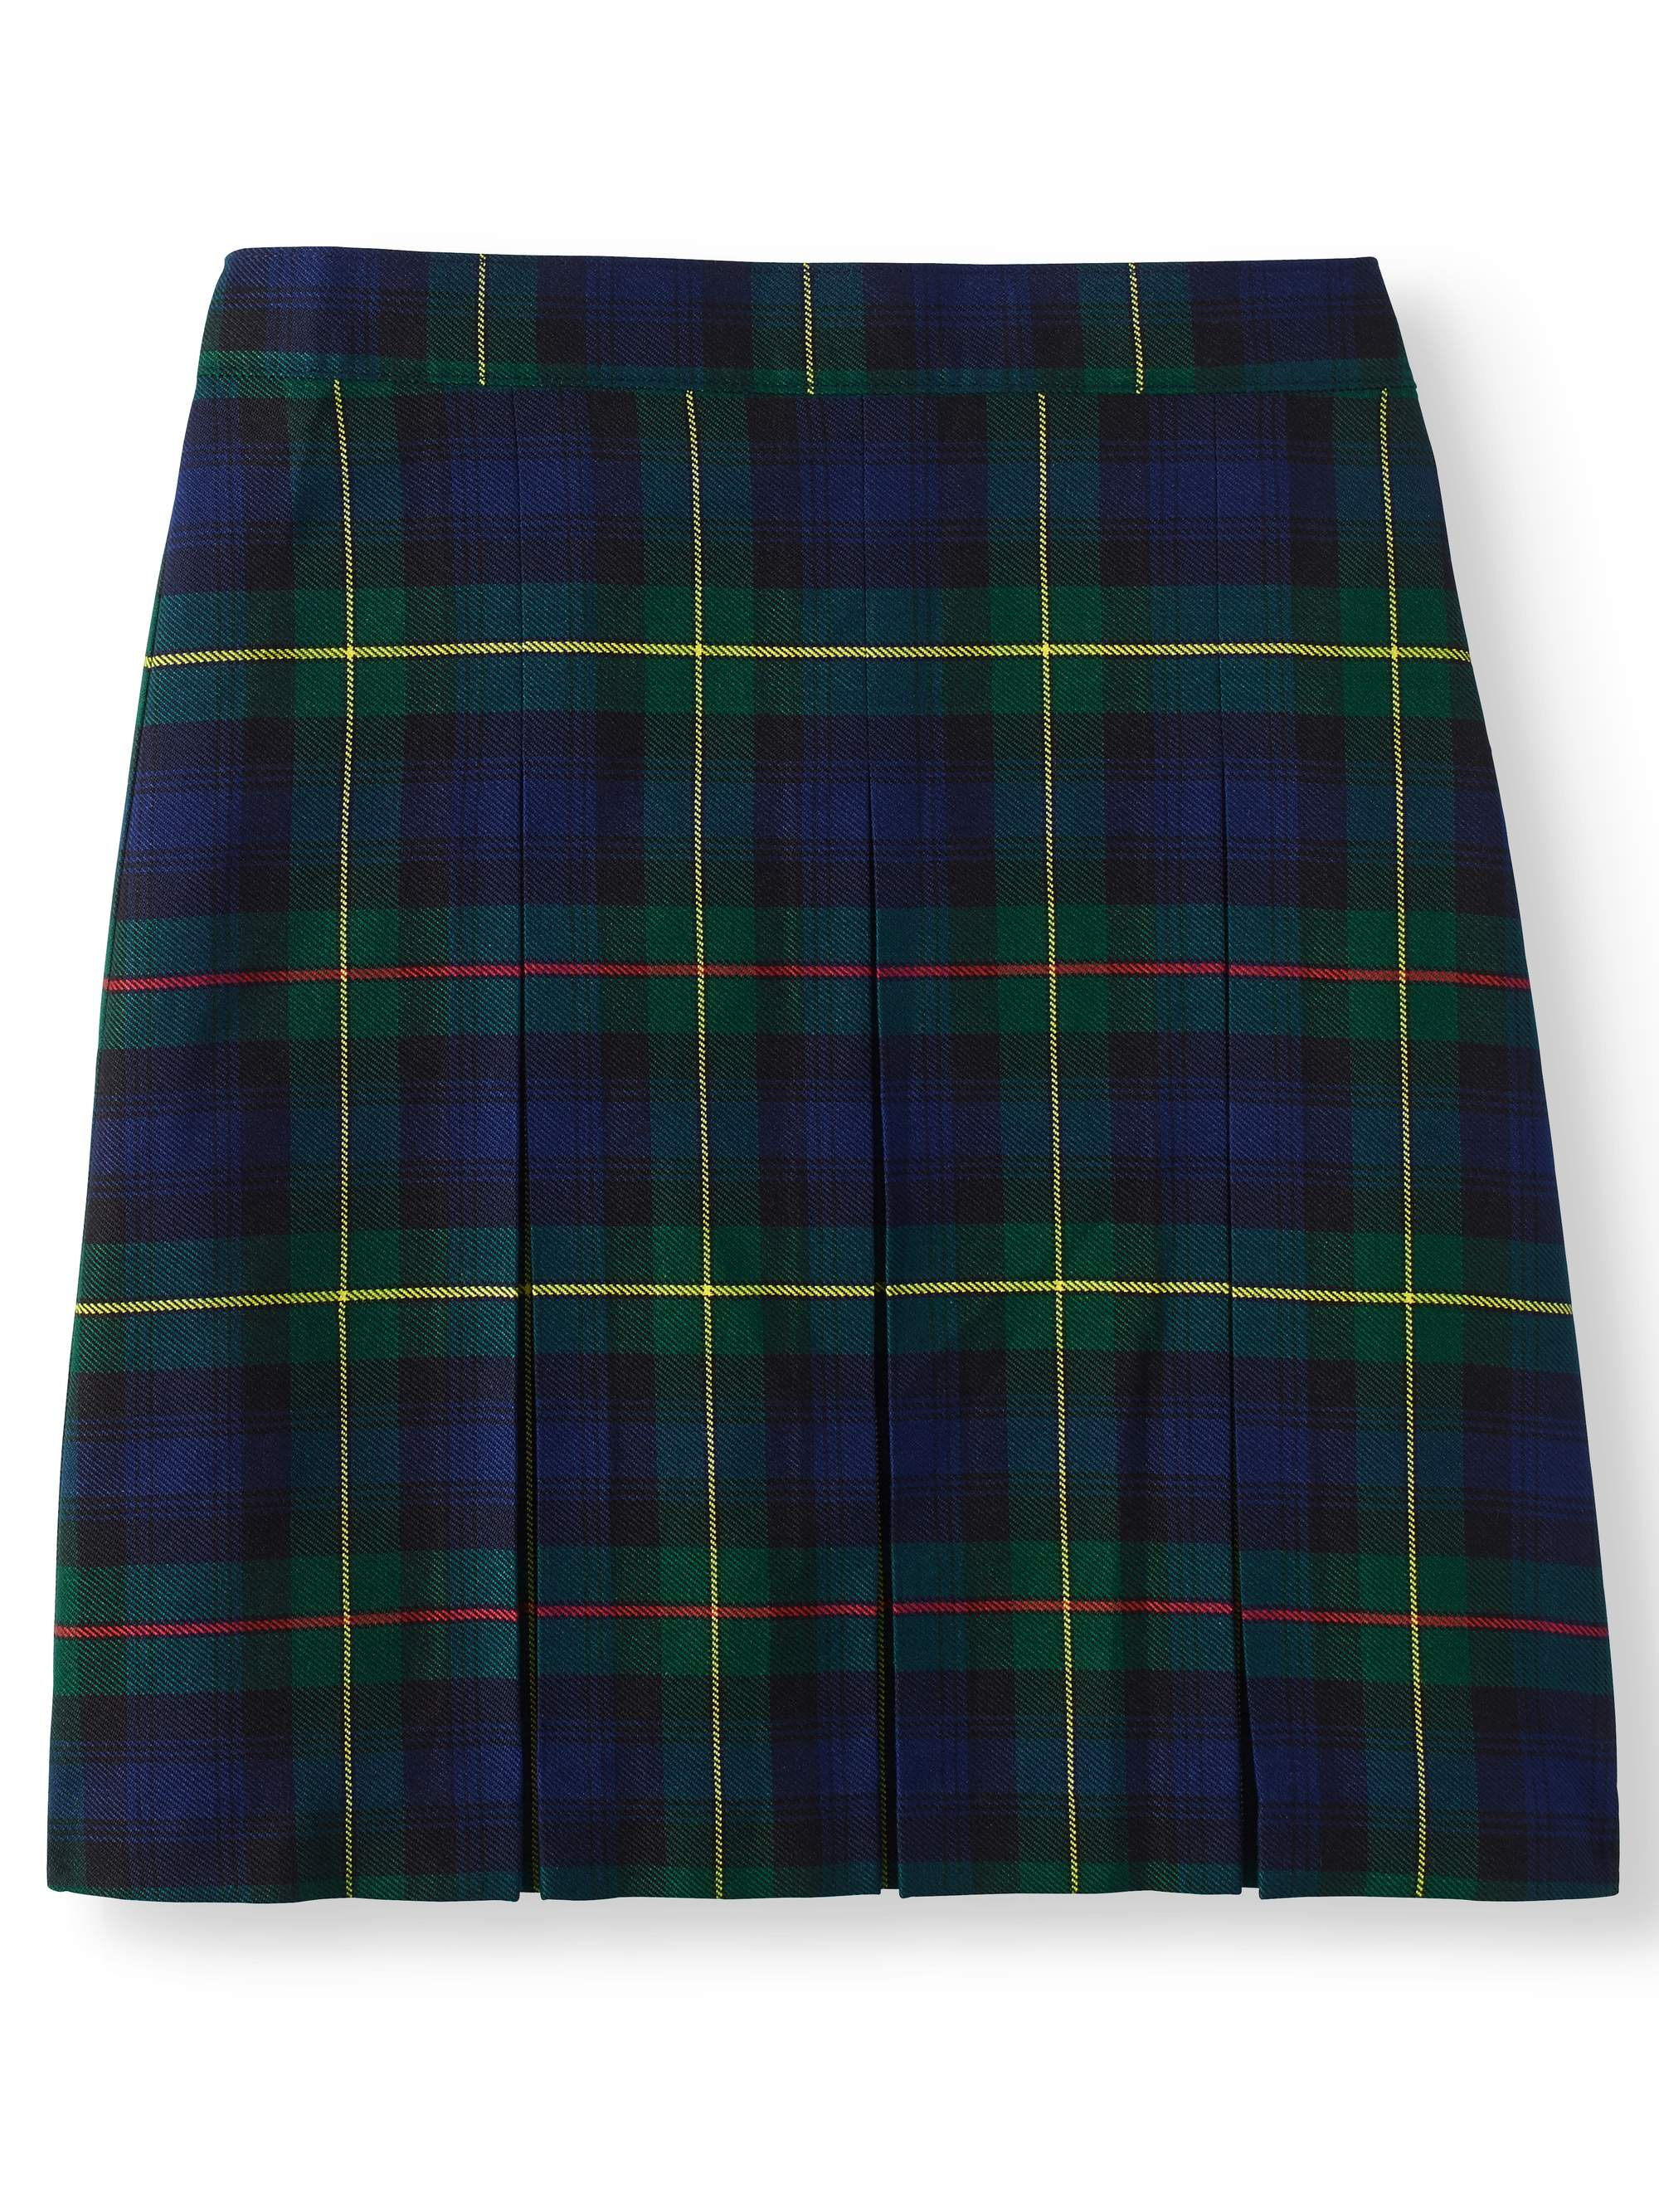 Girls School Uniform Plaid Parochial Skirt